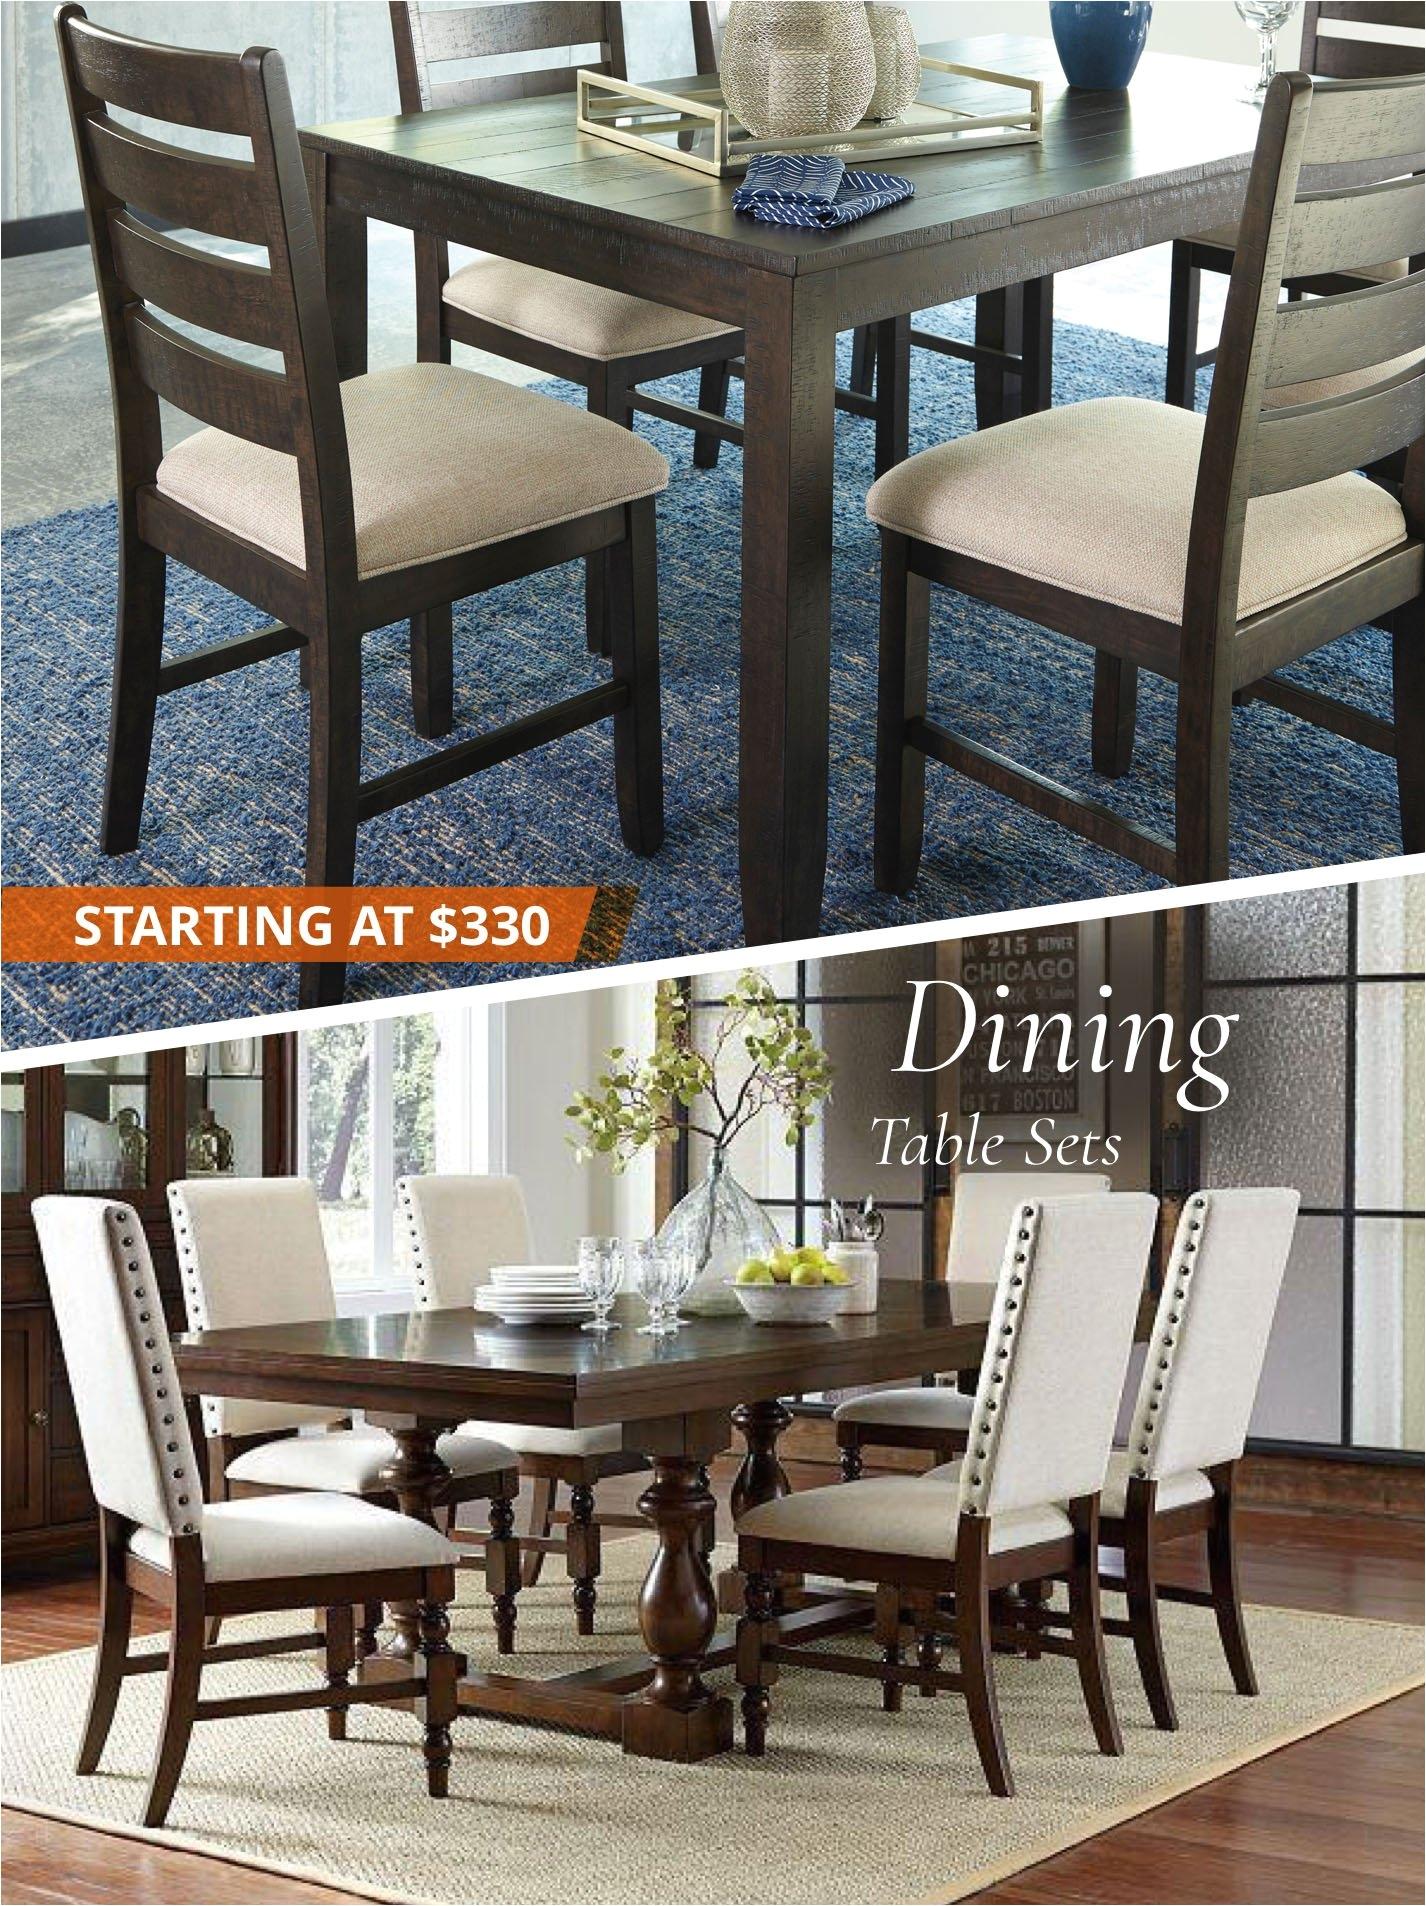 header dining330 mobile